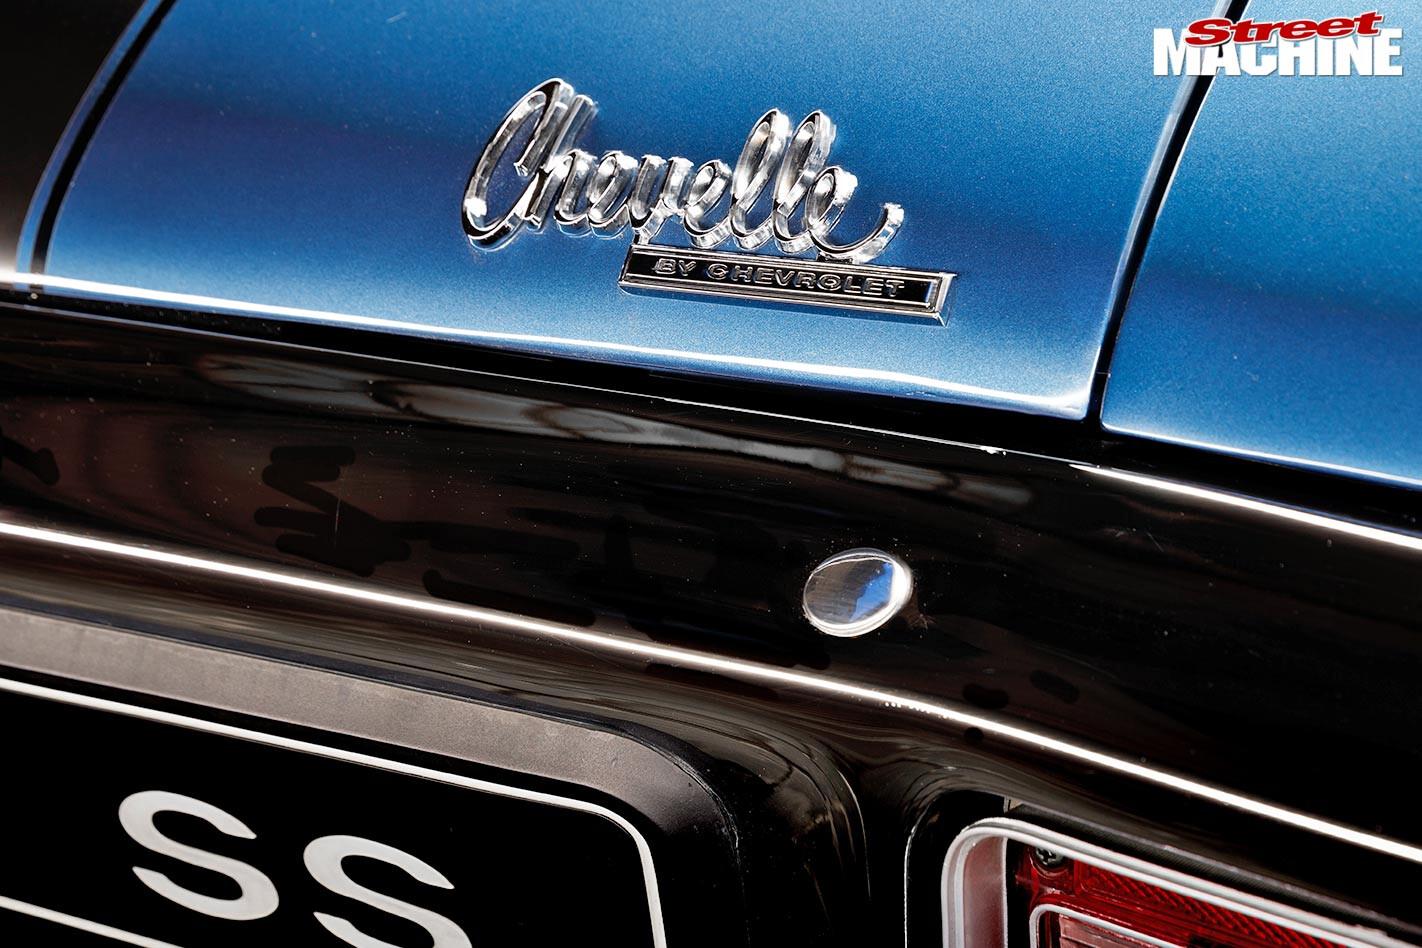 Chevelle SS badge